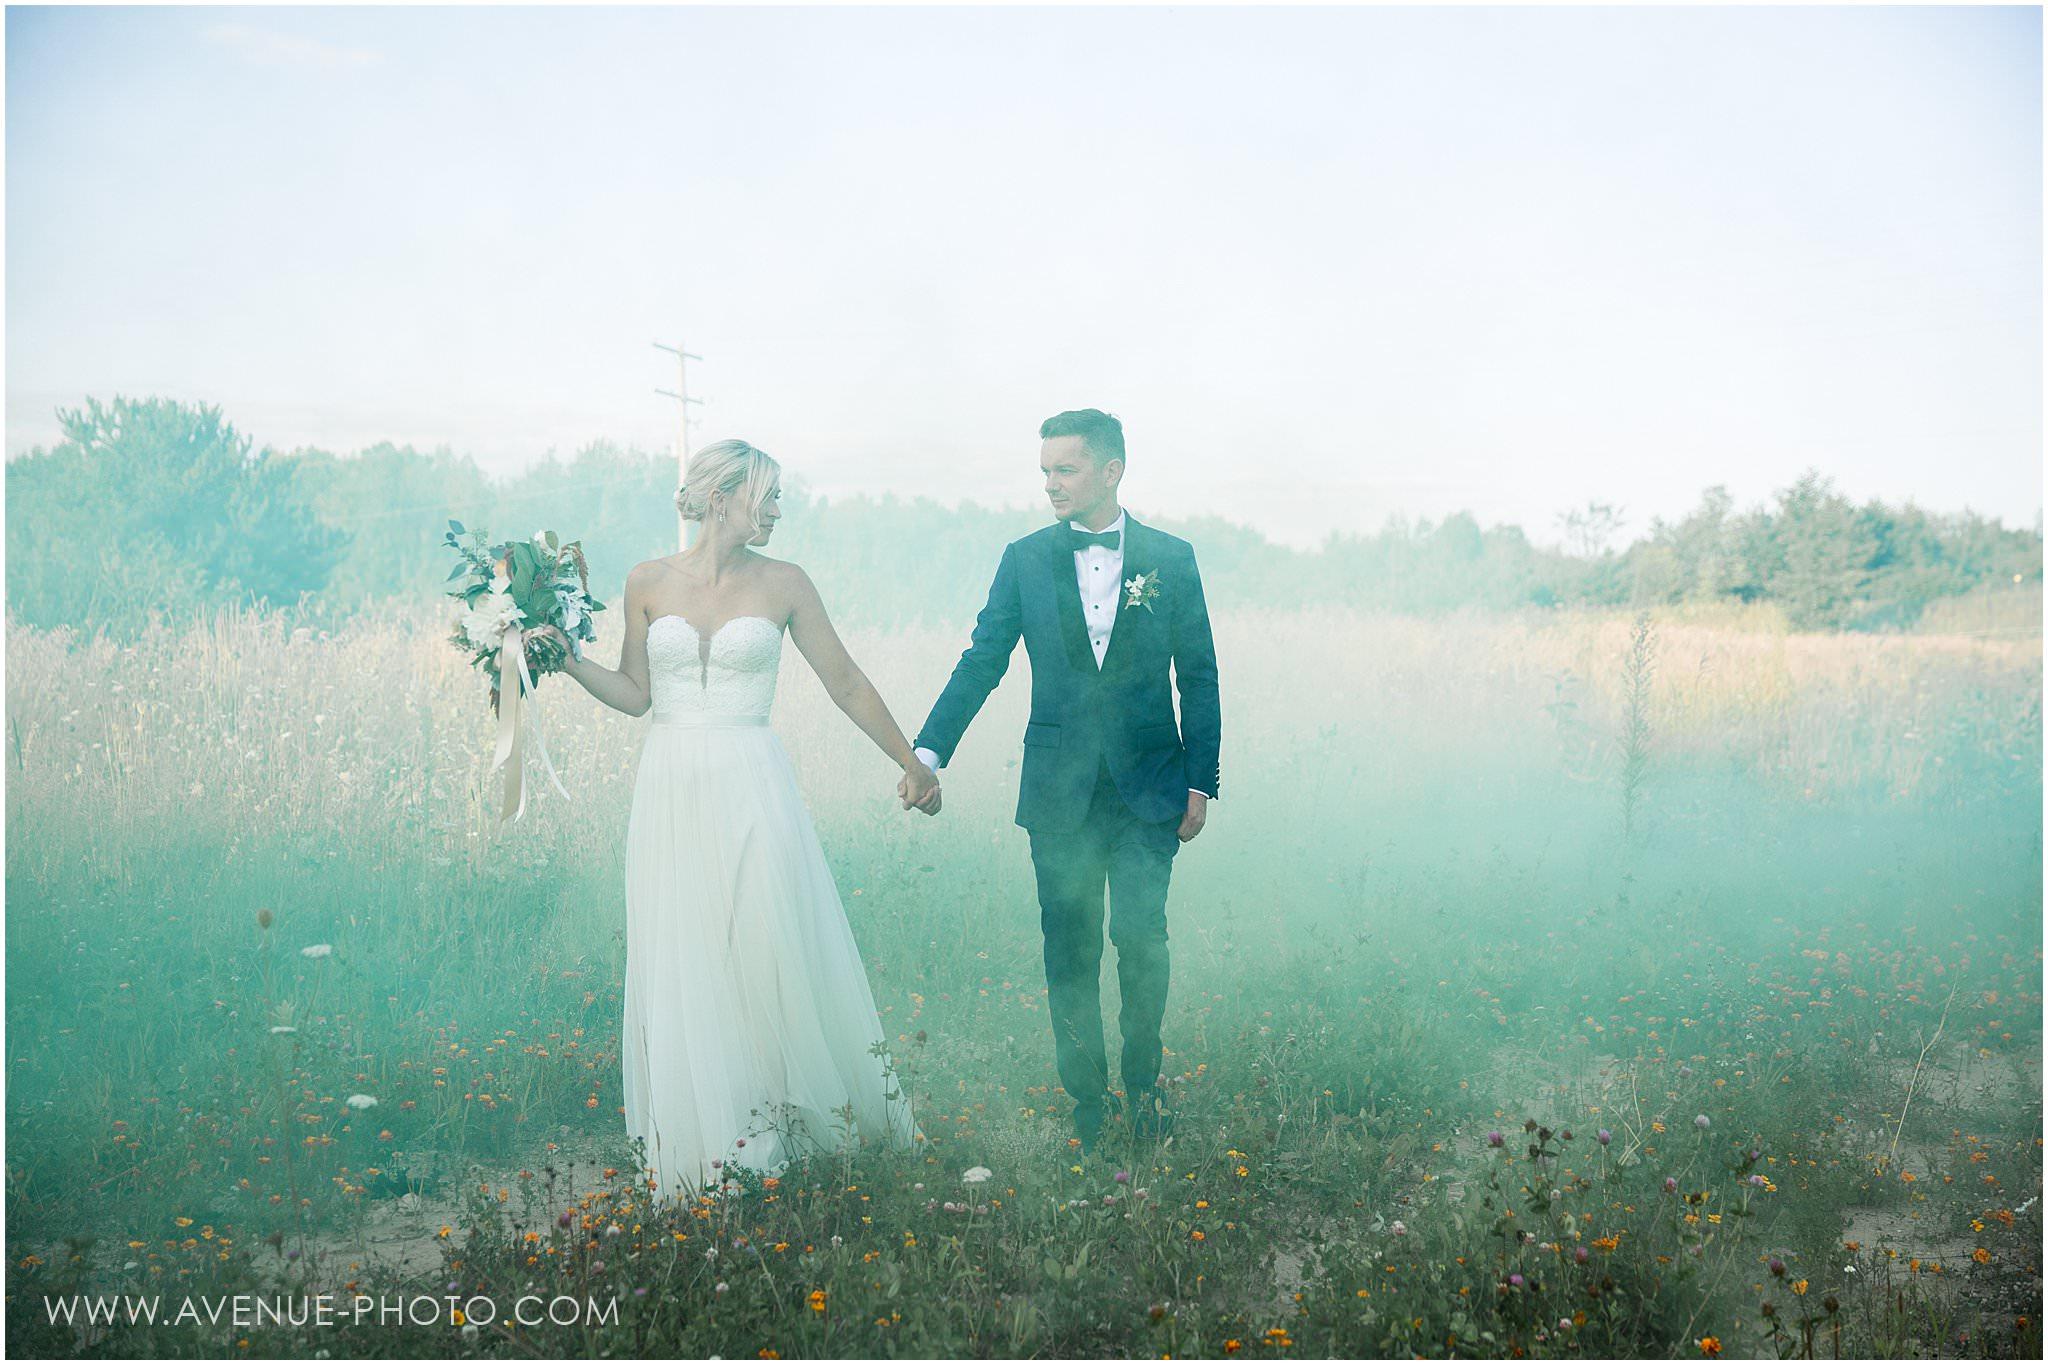 Adamo Estate Winery Wedding Photos, Hockley Valley Wedding Photos, Orangeville Wedding Photos, Vineyard Wedding, Avenue Photo, Smoke Bomb